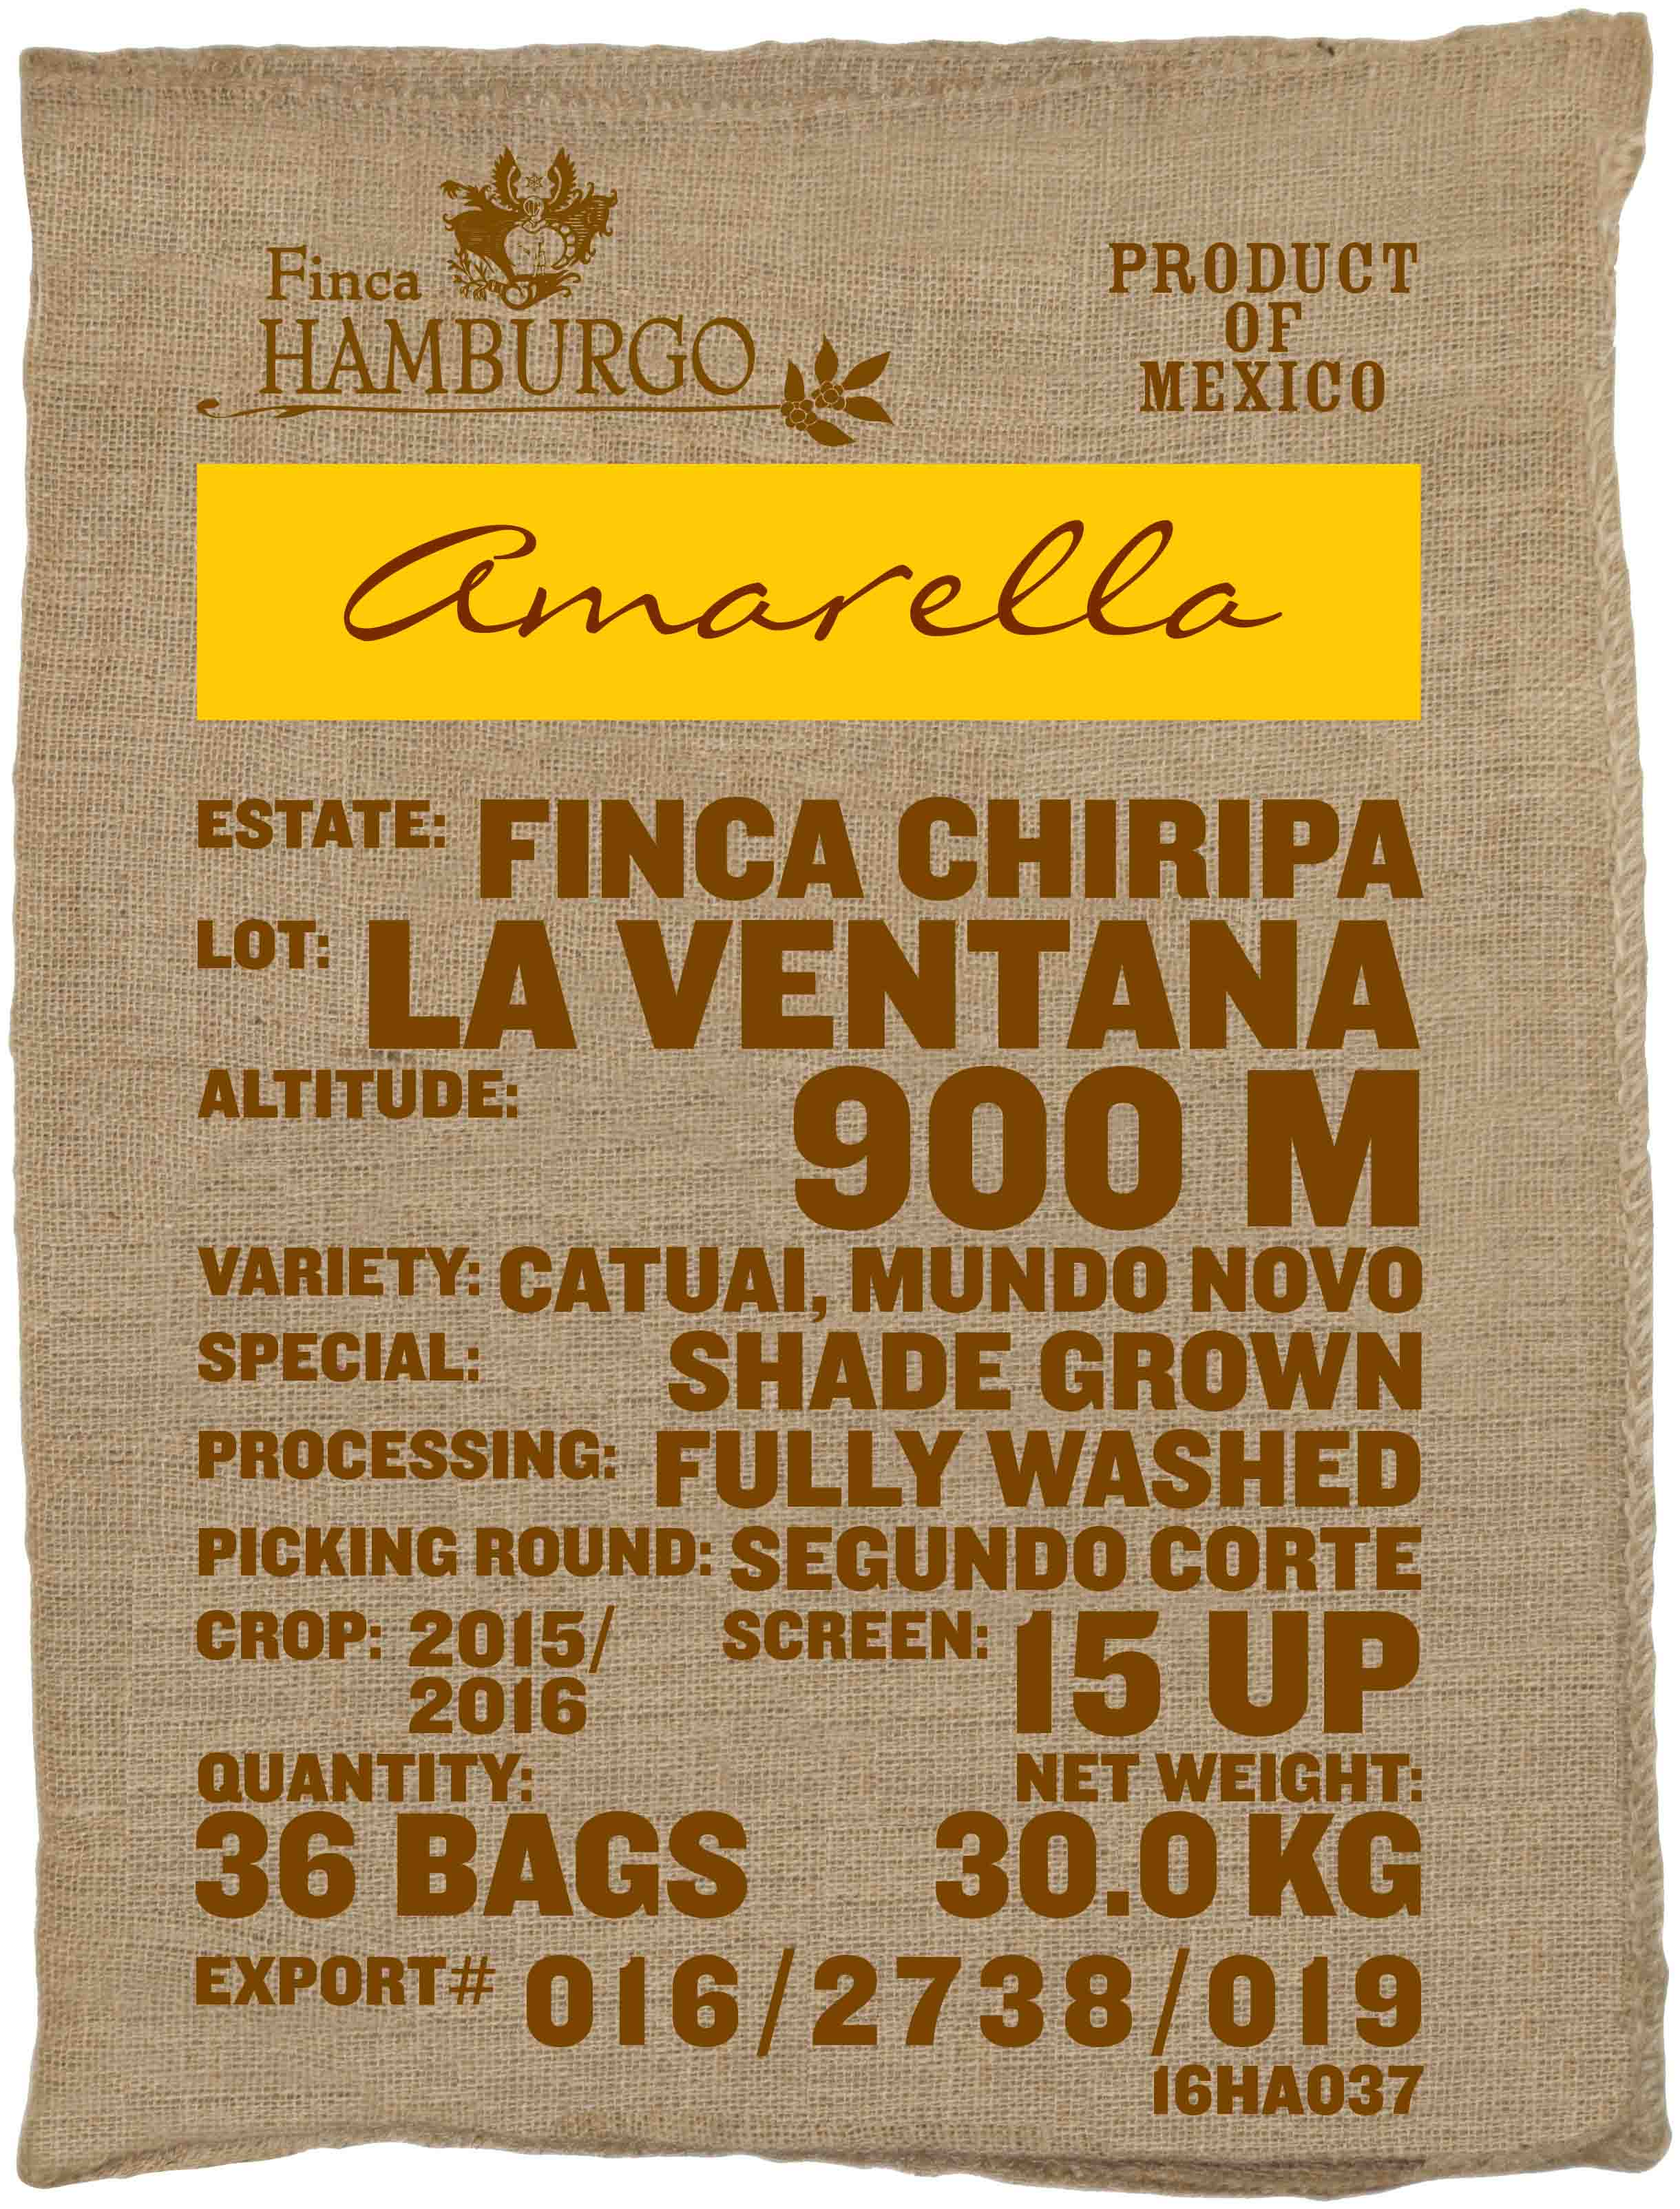 Ein Rohkaffeesack amarella Parzellenkaffee Varietät Catuai, Mundo Novo. Finca Chiripa Lot La Ventana.